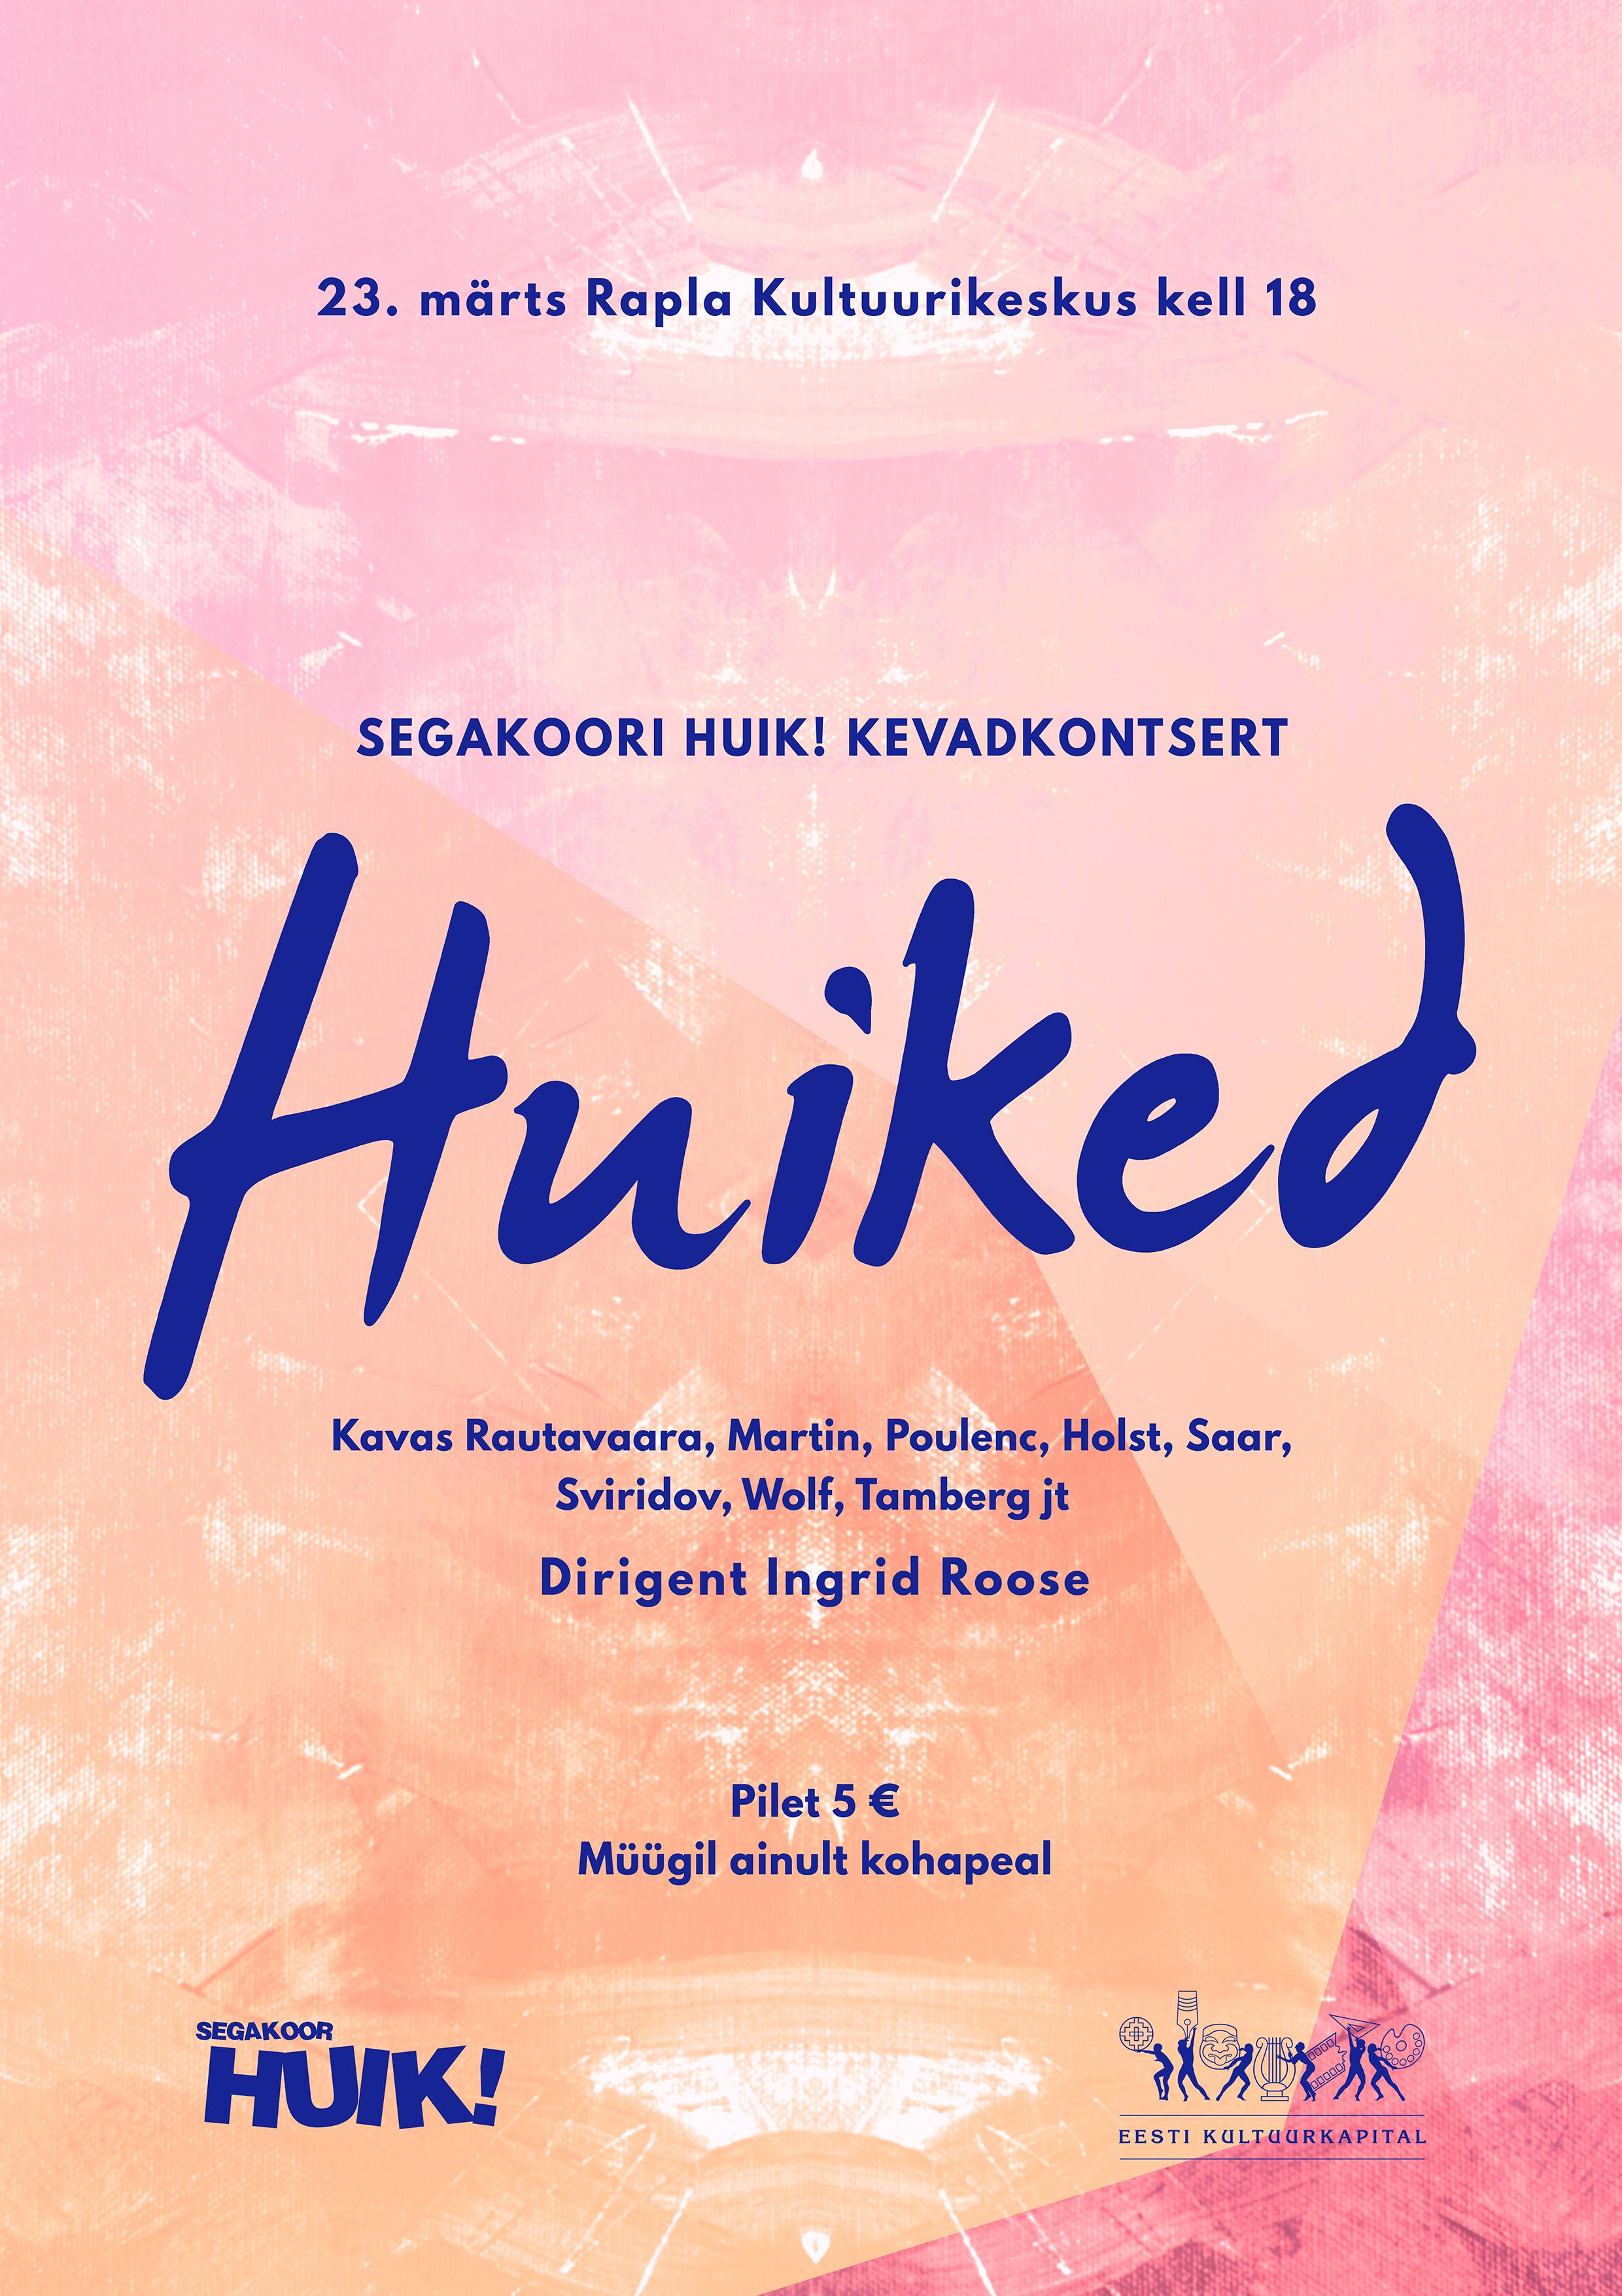 "Segakoori HUIK kevadkontsert ""Huiked"""